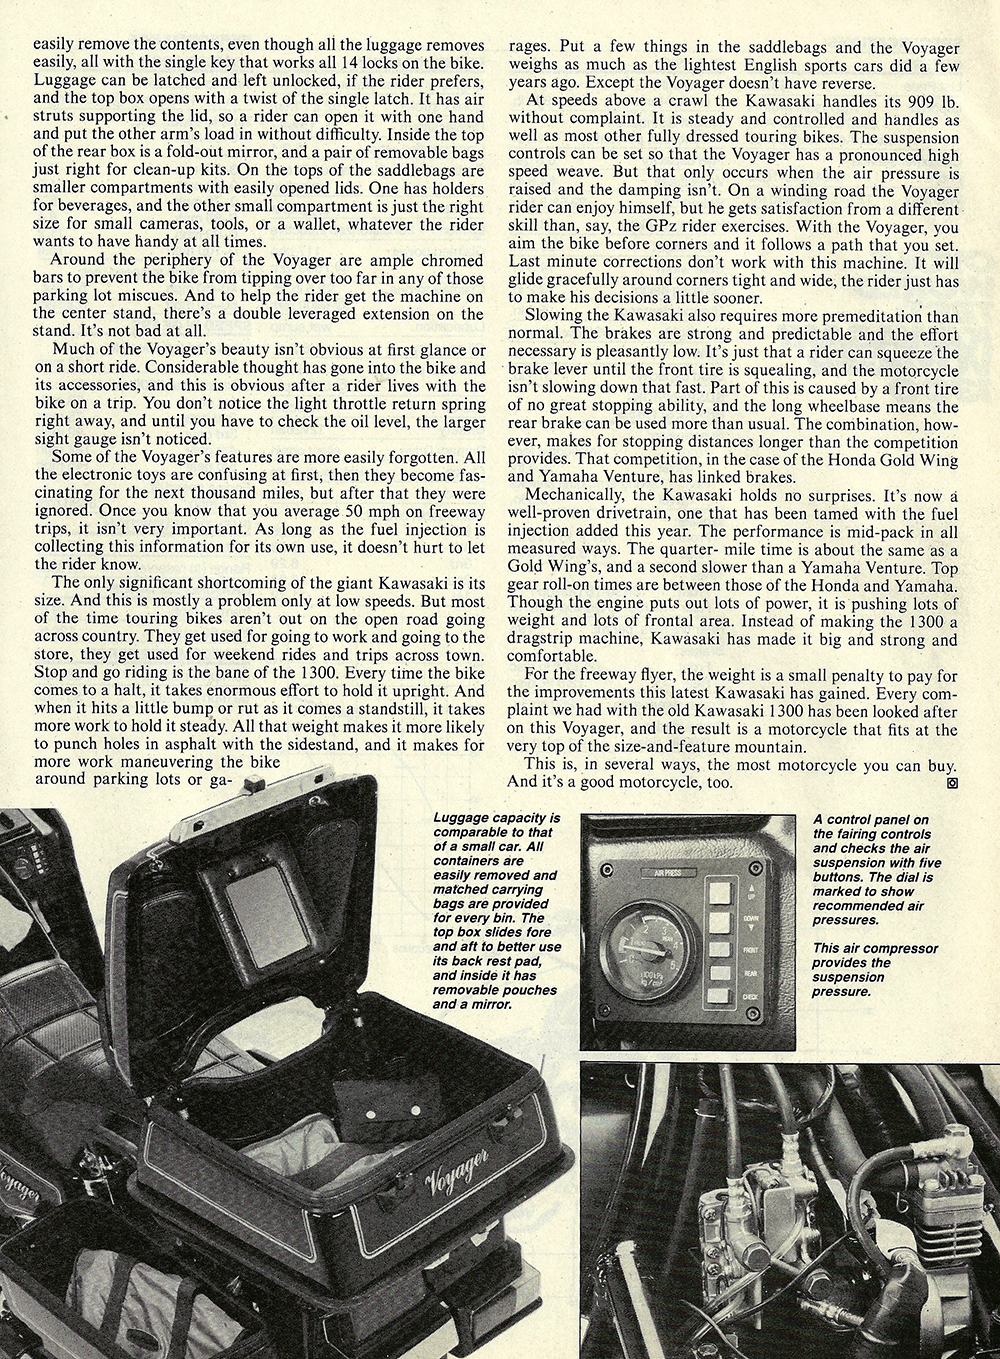 1983 Kawasaki Voyager 1300 road test 06.jpg